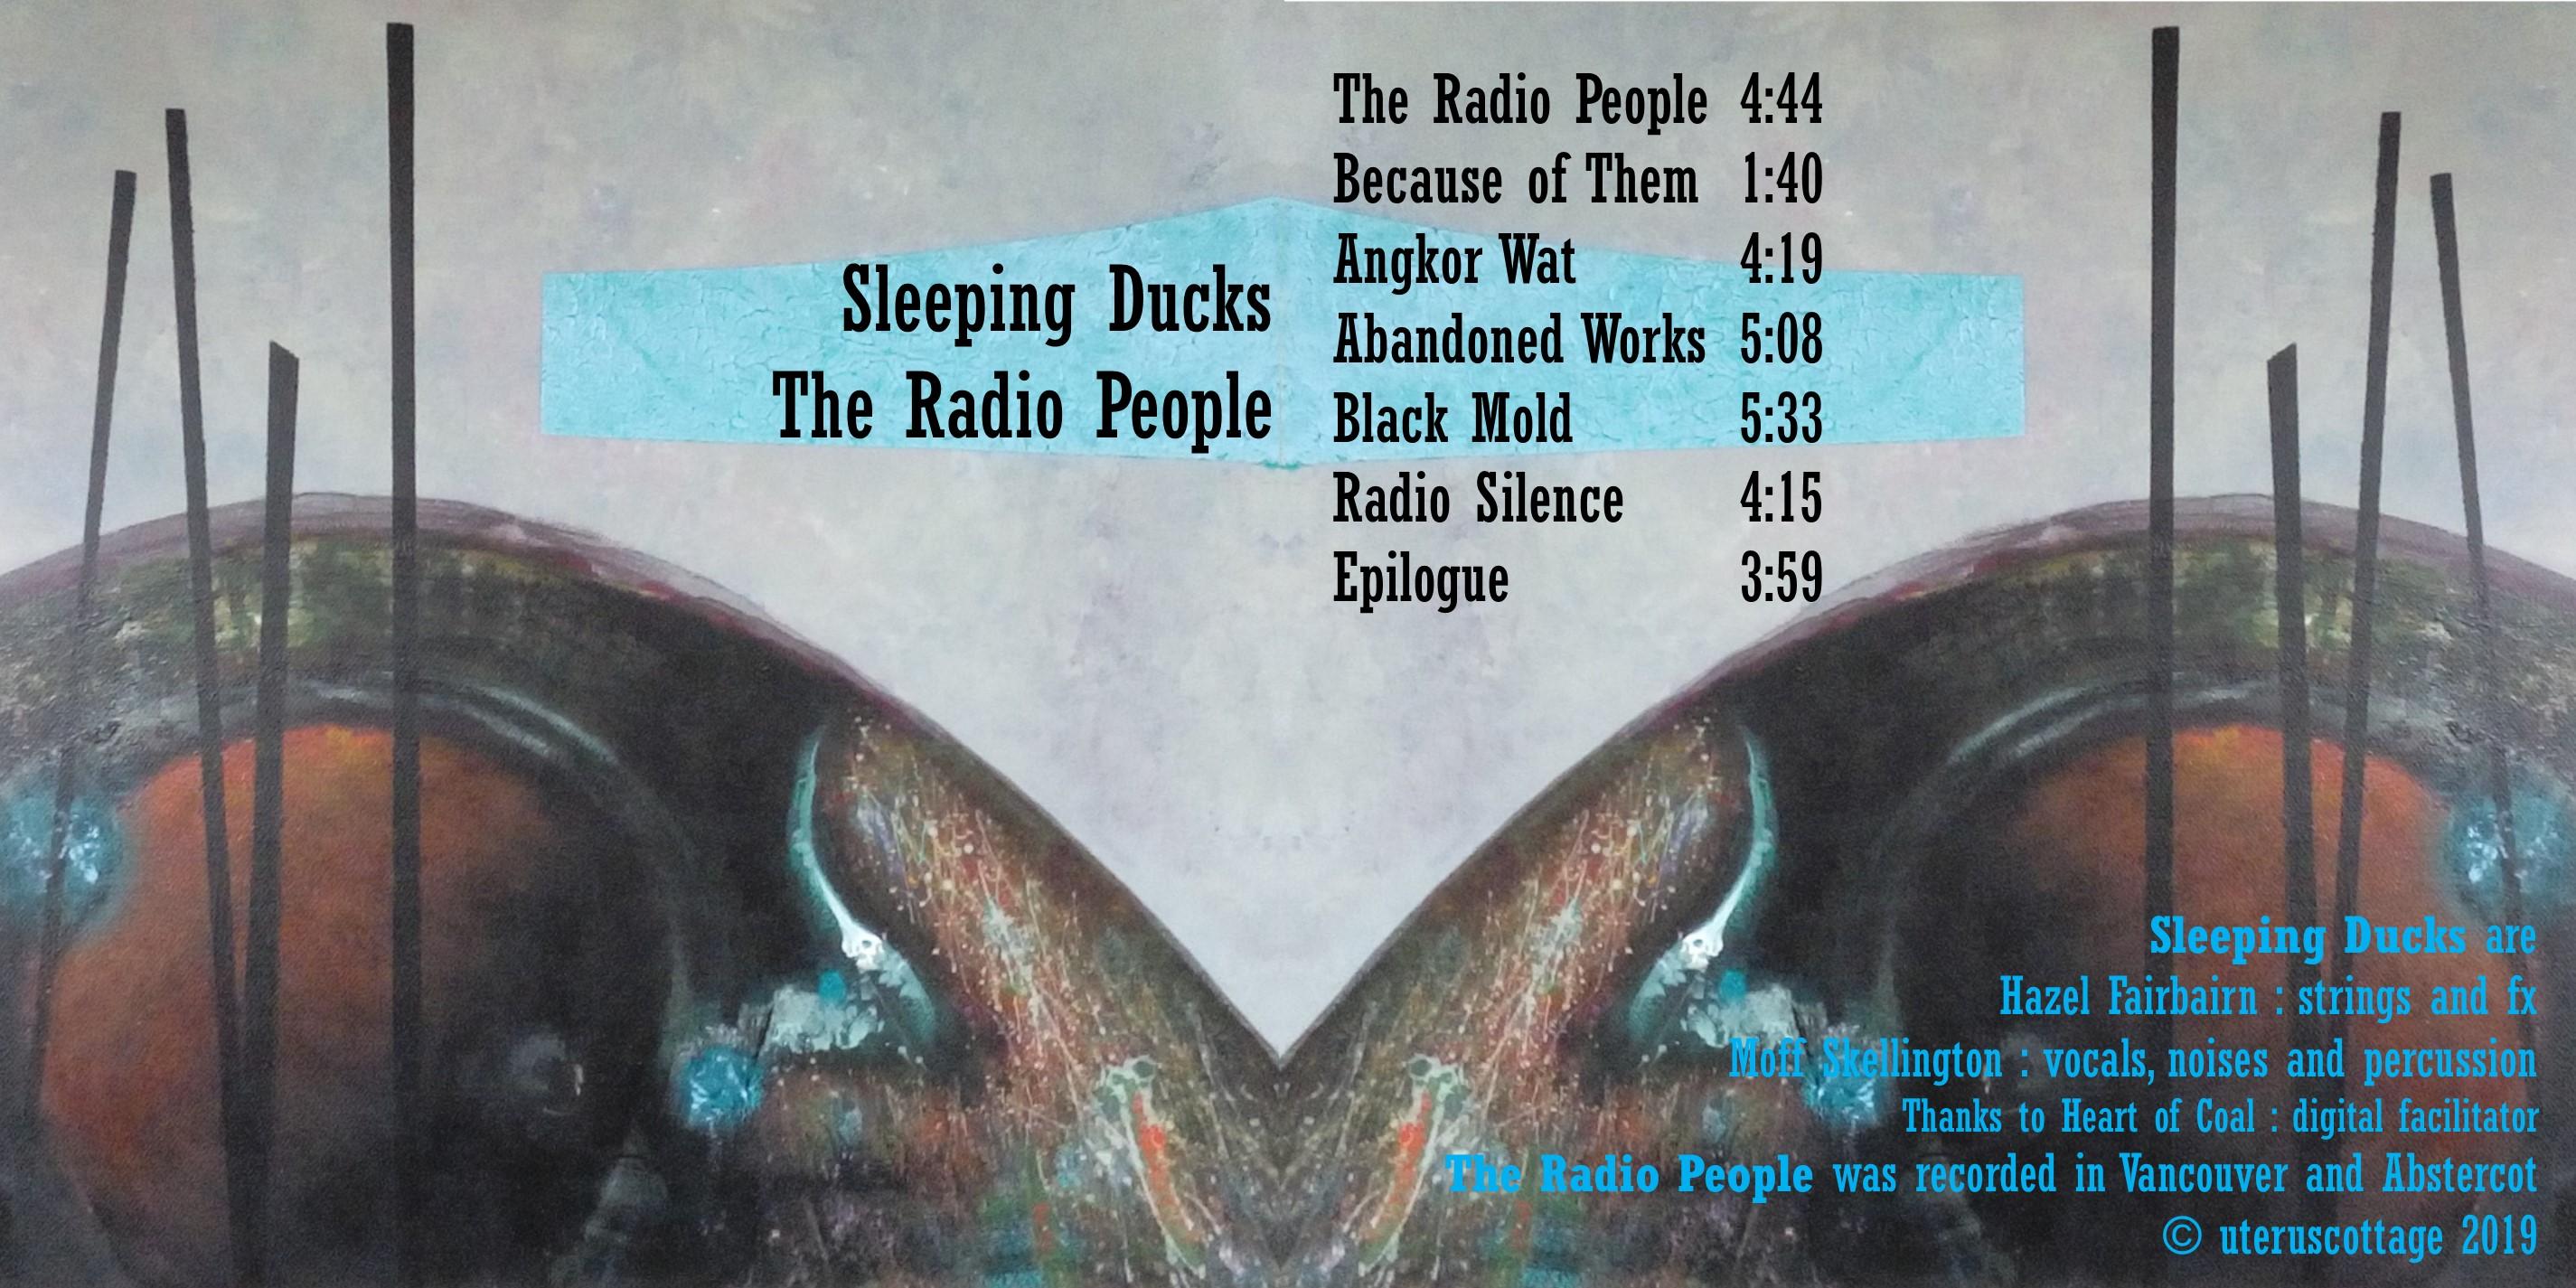 Sleeping Ducks The Radio People